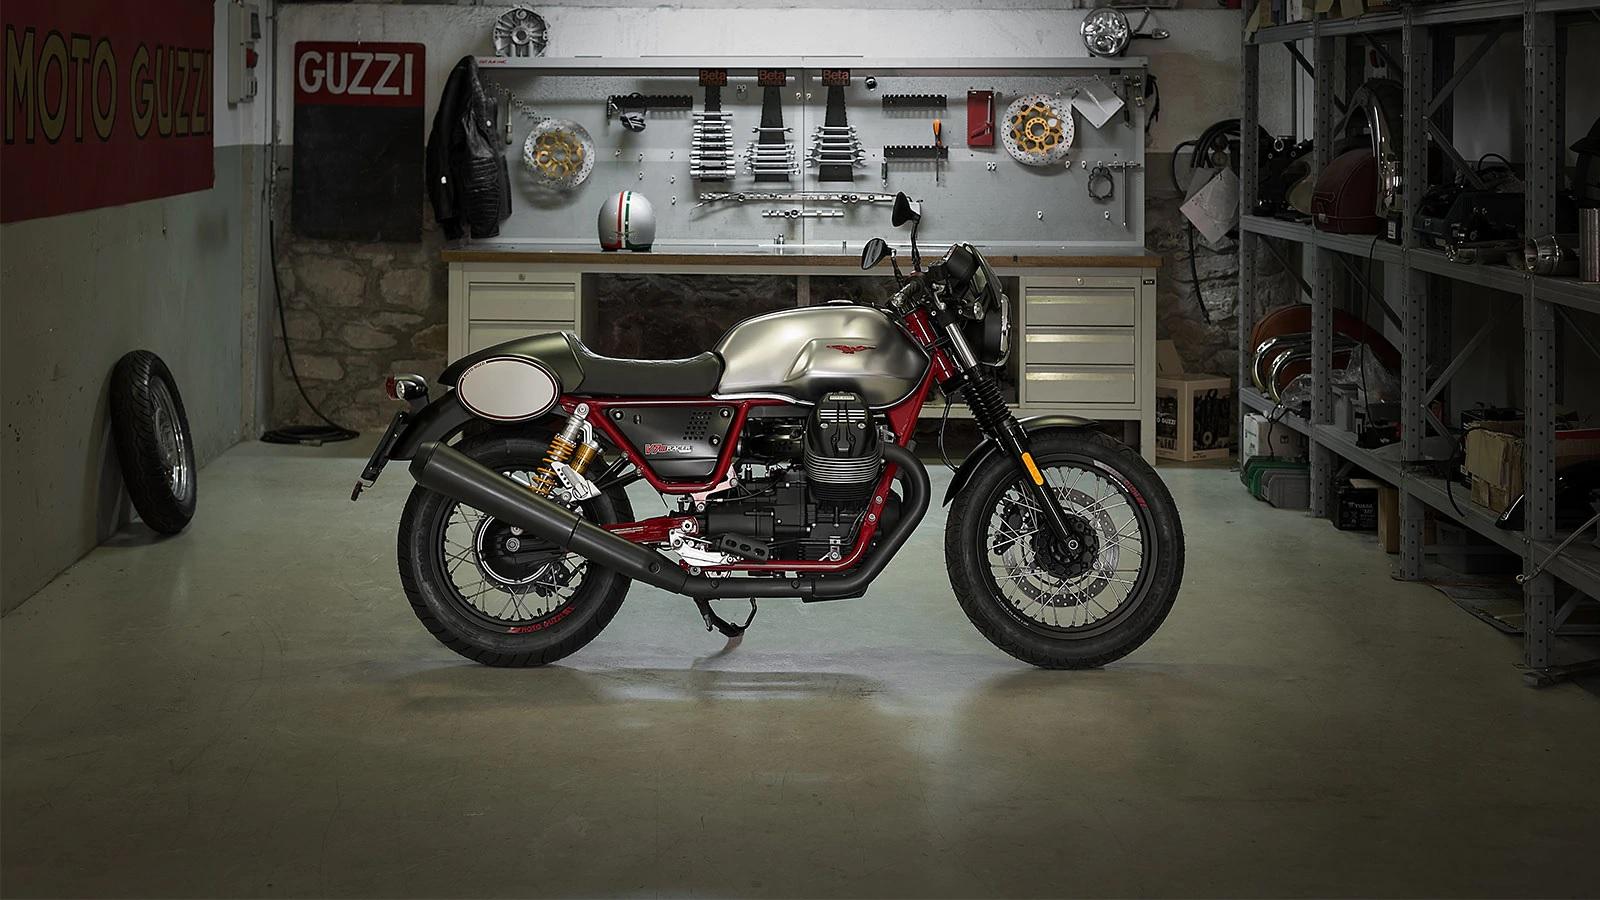 2018 Moto Guzzi V7 III Racer 750